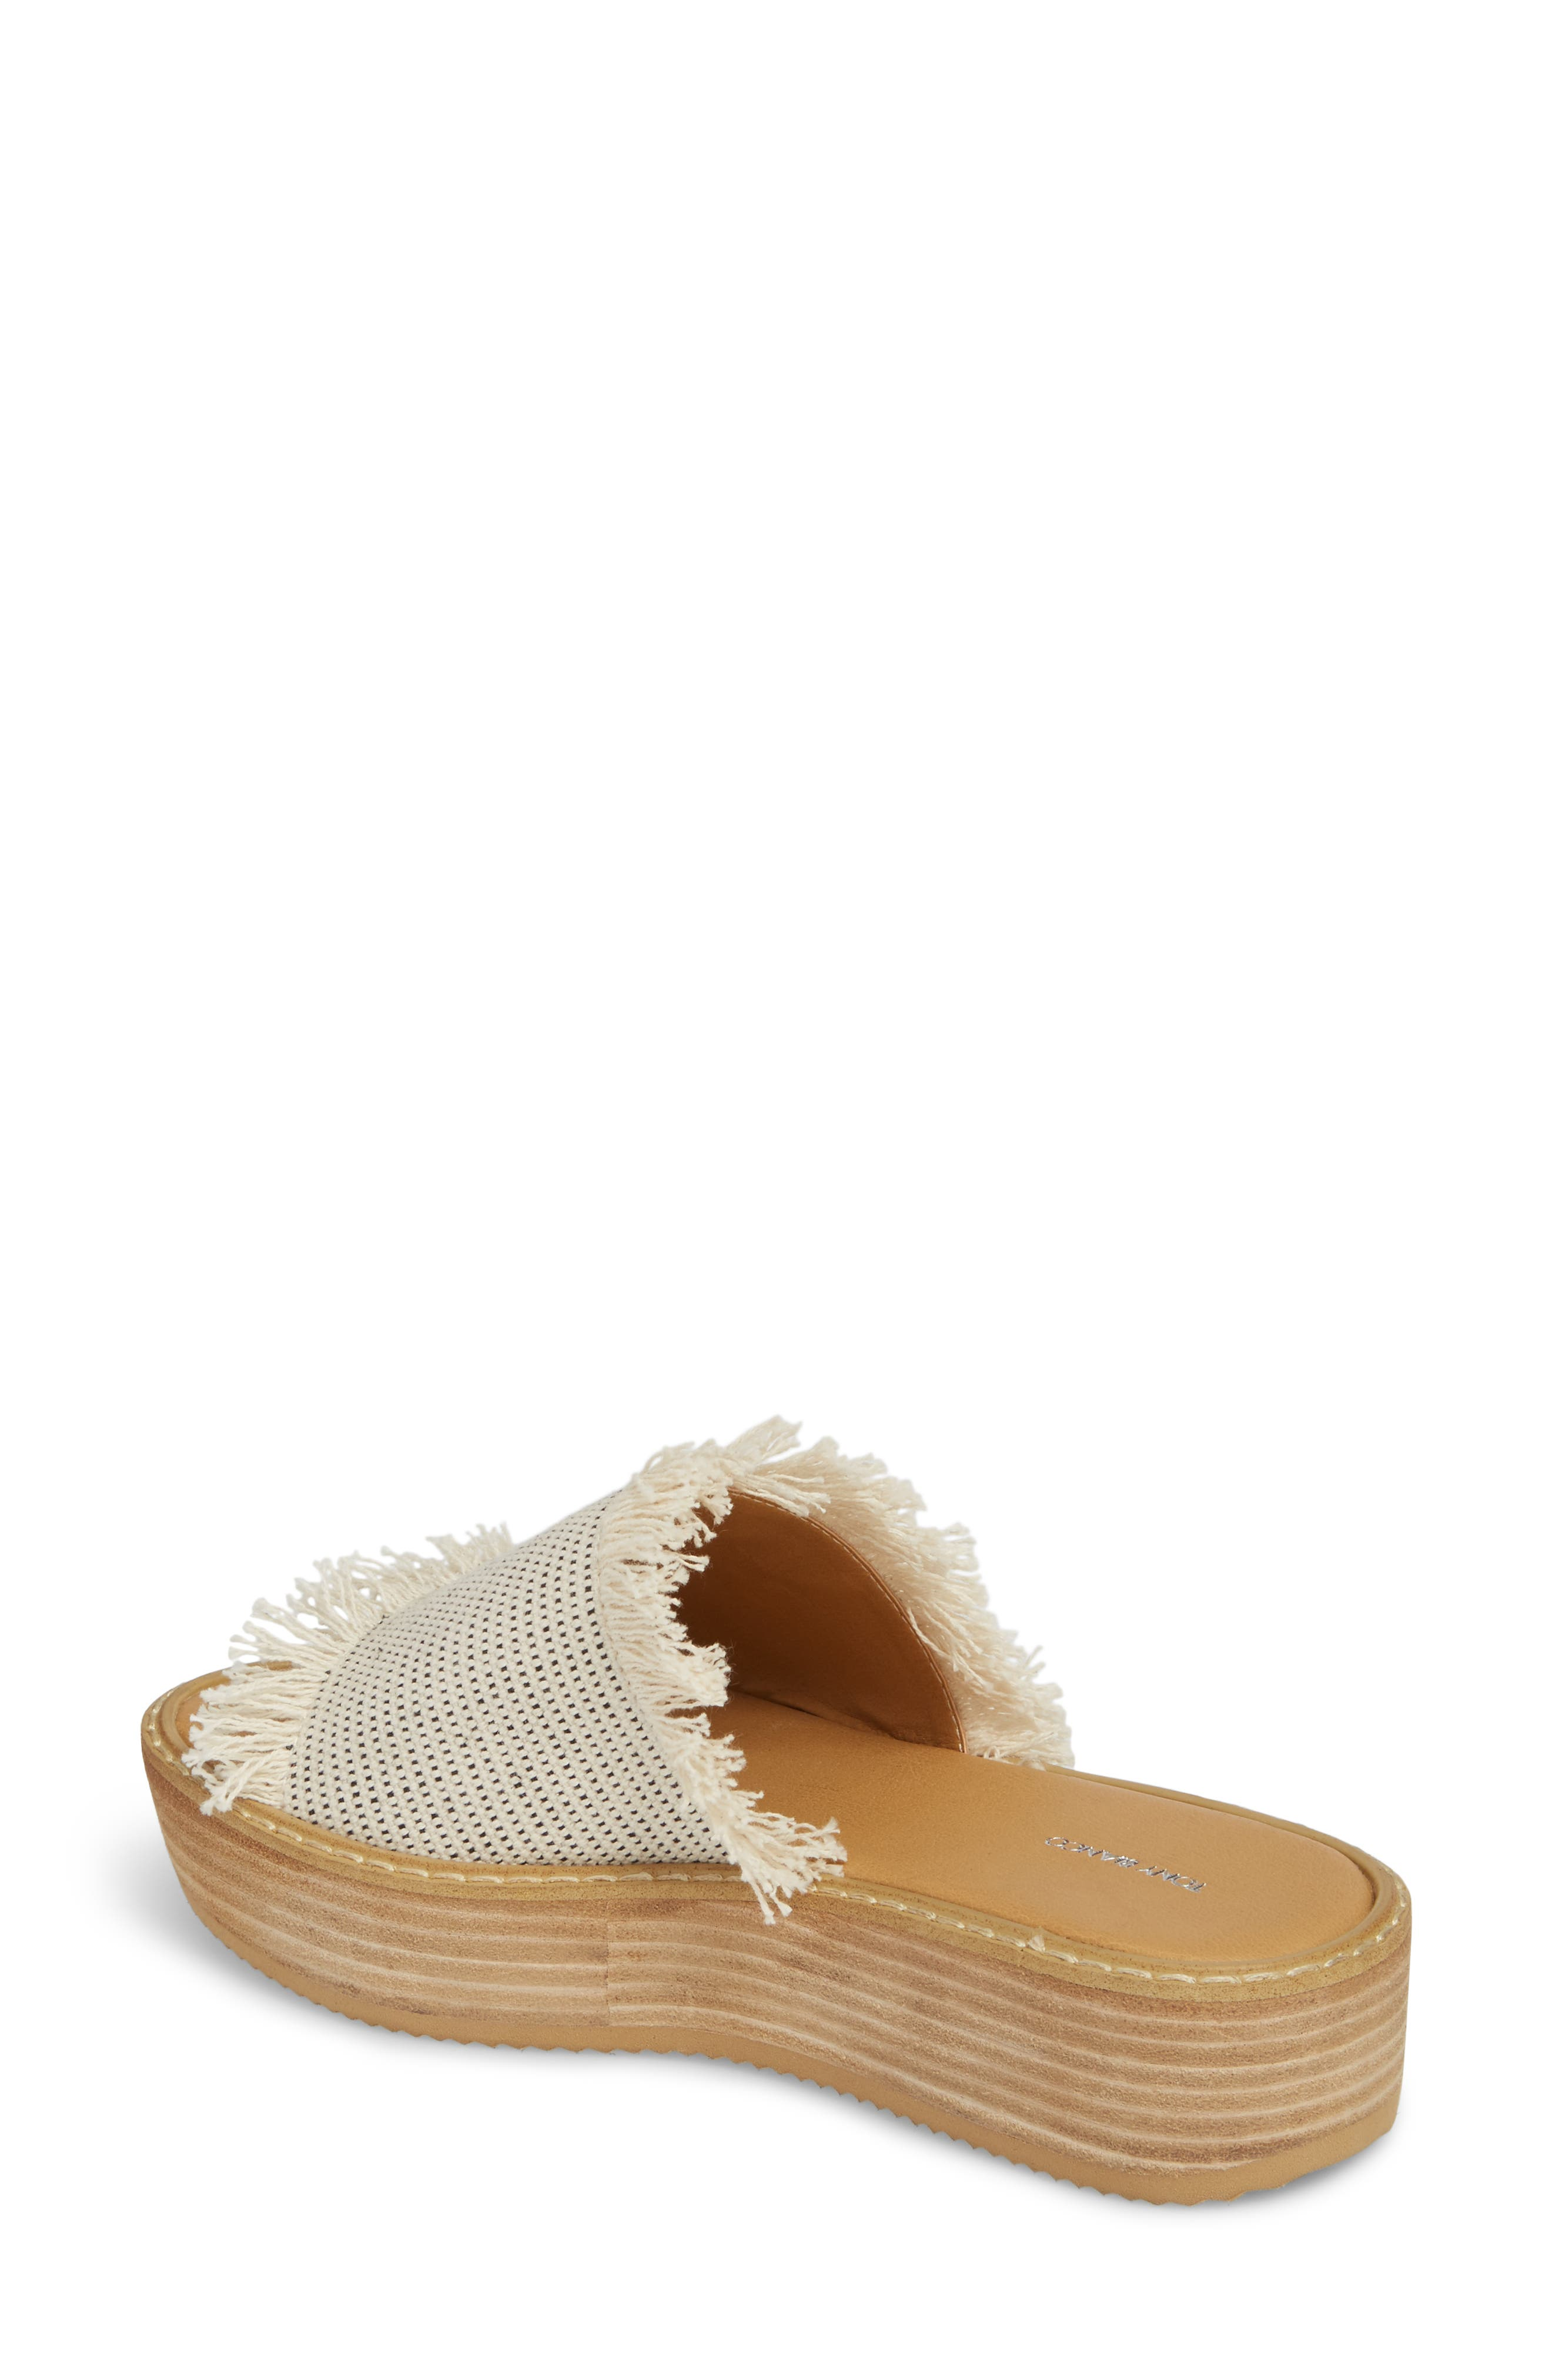 Ebony Platform Sandal,                             Alternate thumbnail 2, color,                             100